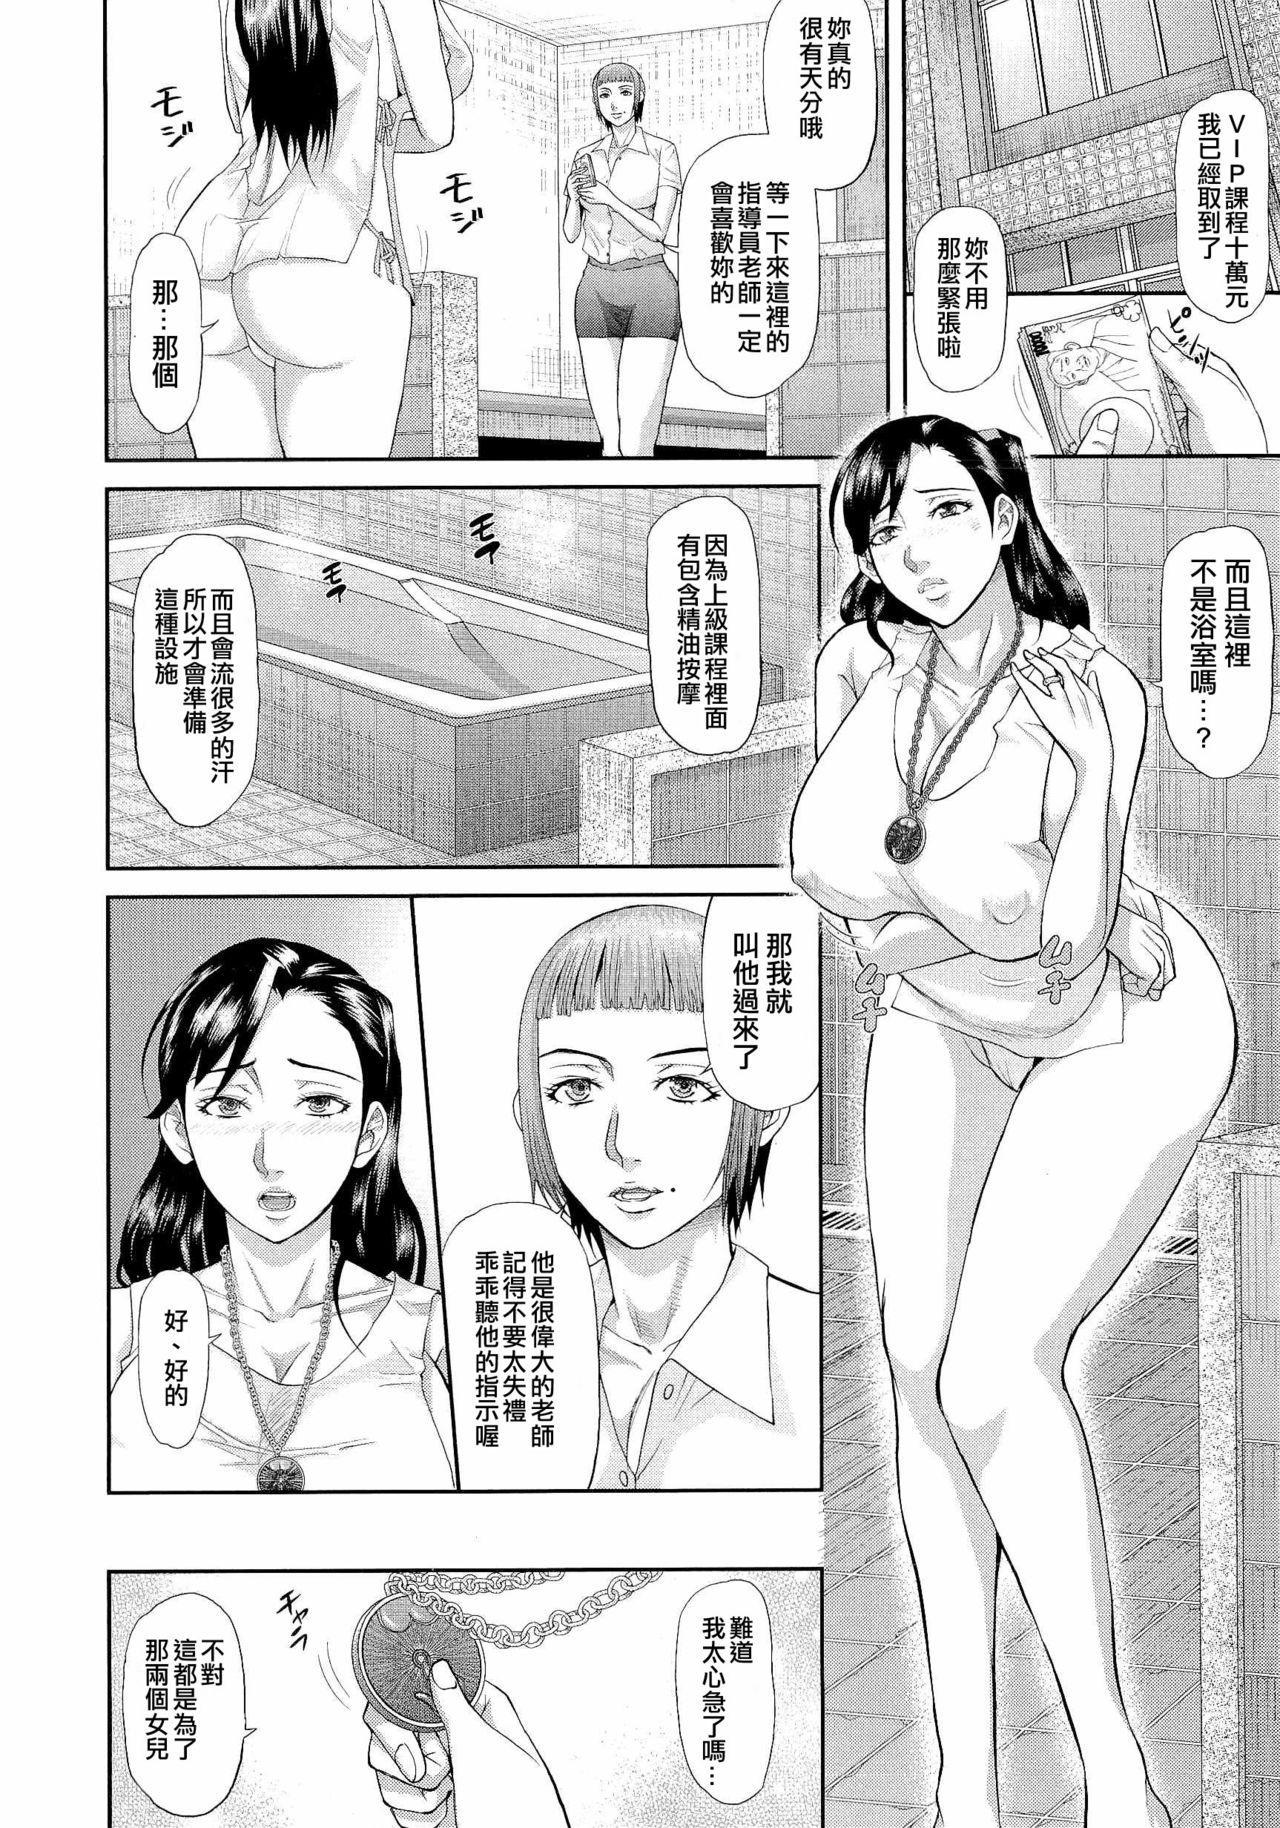 [Honebuto Danshaku] Innou Kaizou Program ~Oyako Zecchou Cult Ochi~ [Chinese]【不想记名重嵌--高质量图源】 17